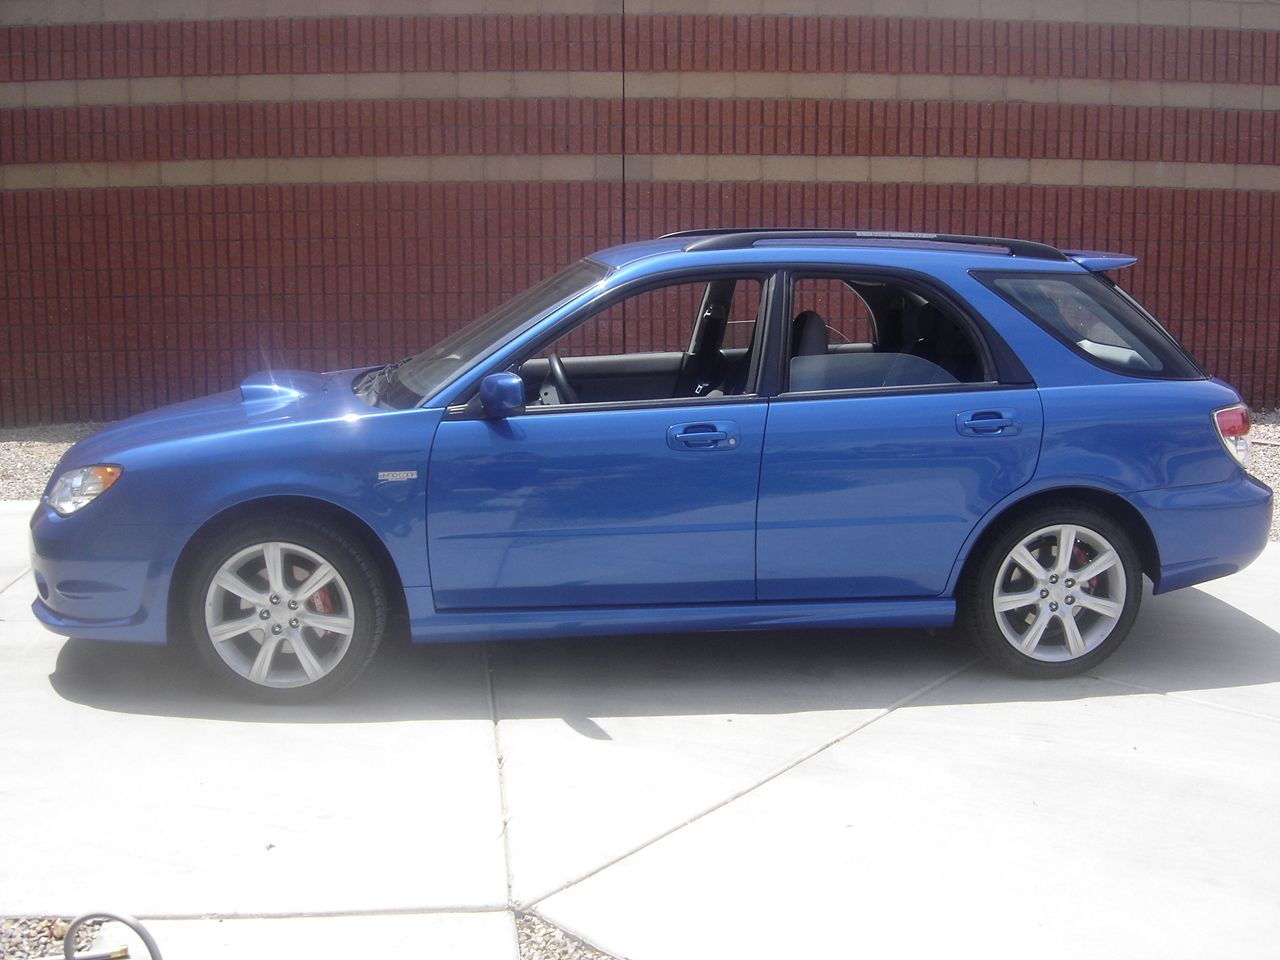 Subaru impreza wrx wagon subaru pinterest wrx wagon subaru subaru impreza wrx wagon vanachro Choice Image